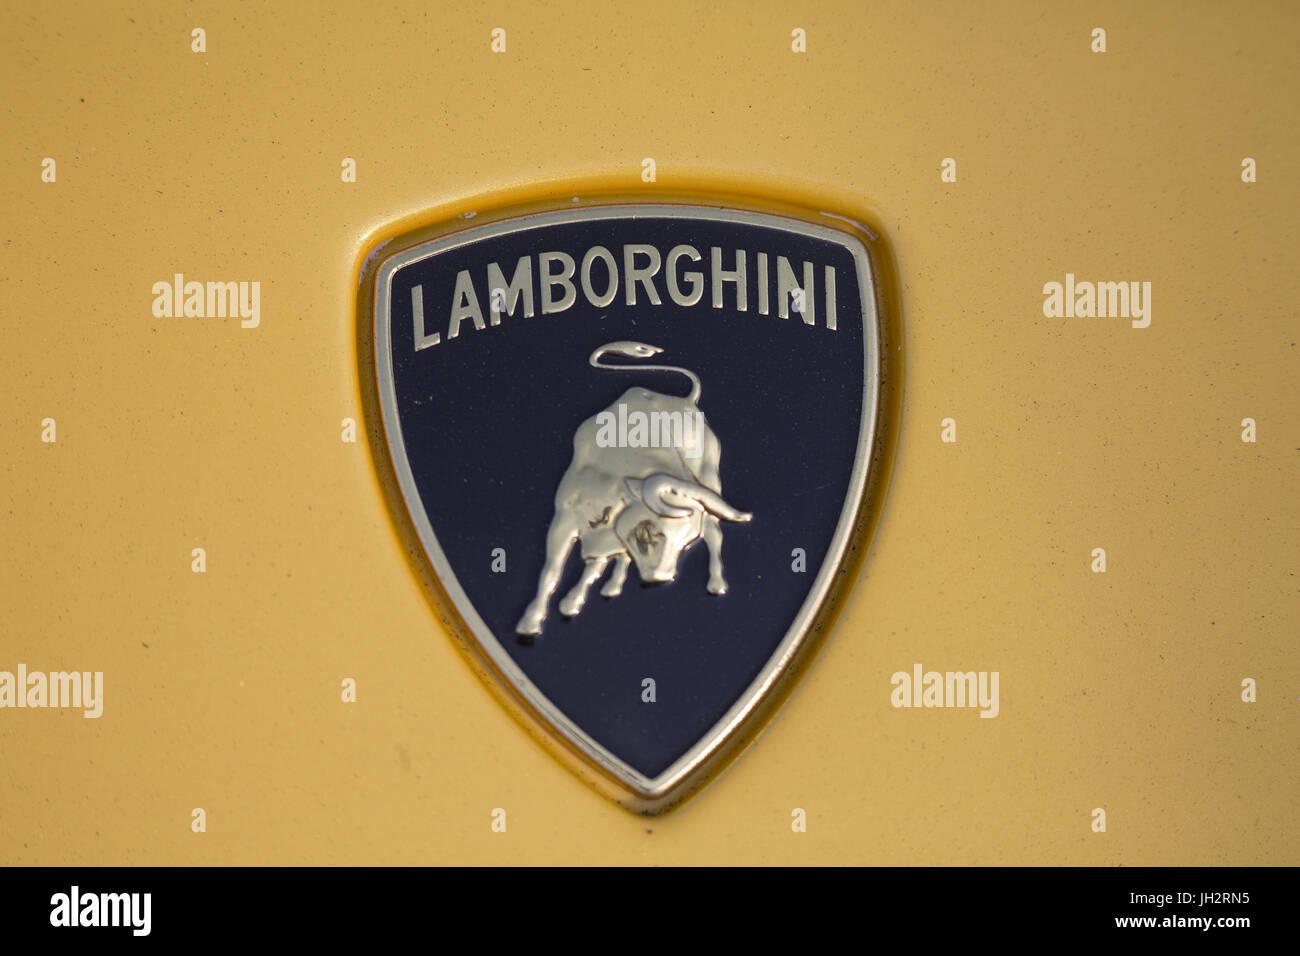 Lamborghini Logo Stock Photos Lamborghini Logo Stock Images Alamy